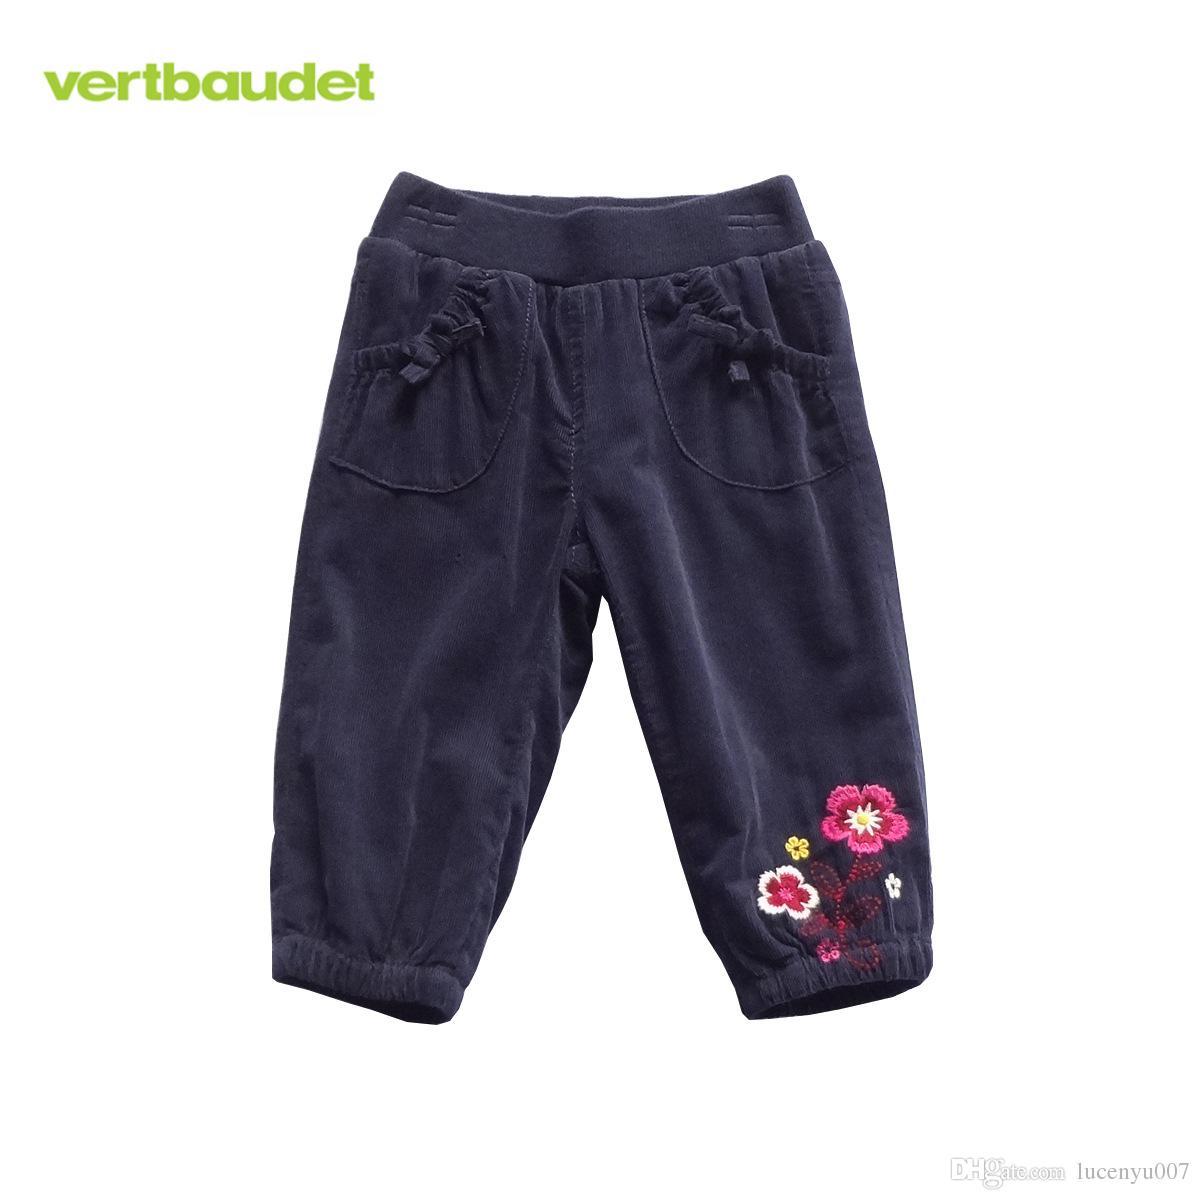 1-3Y Pantalon Fille Girls Corduroy Pants Baby's Jersey-Lined Pants ...